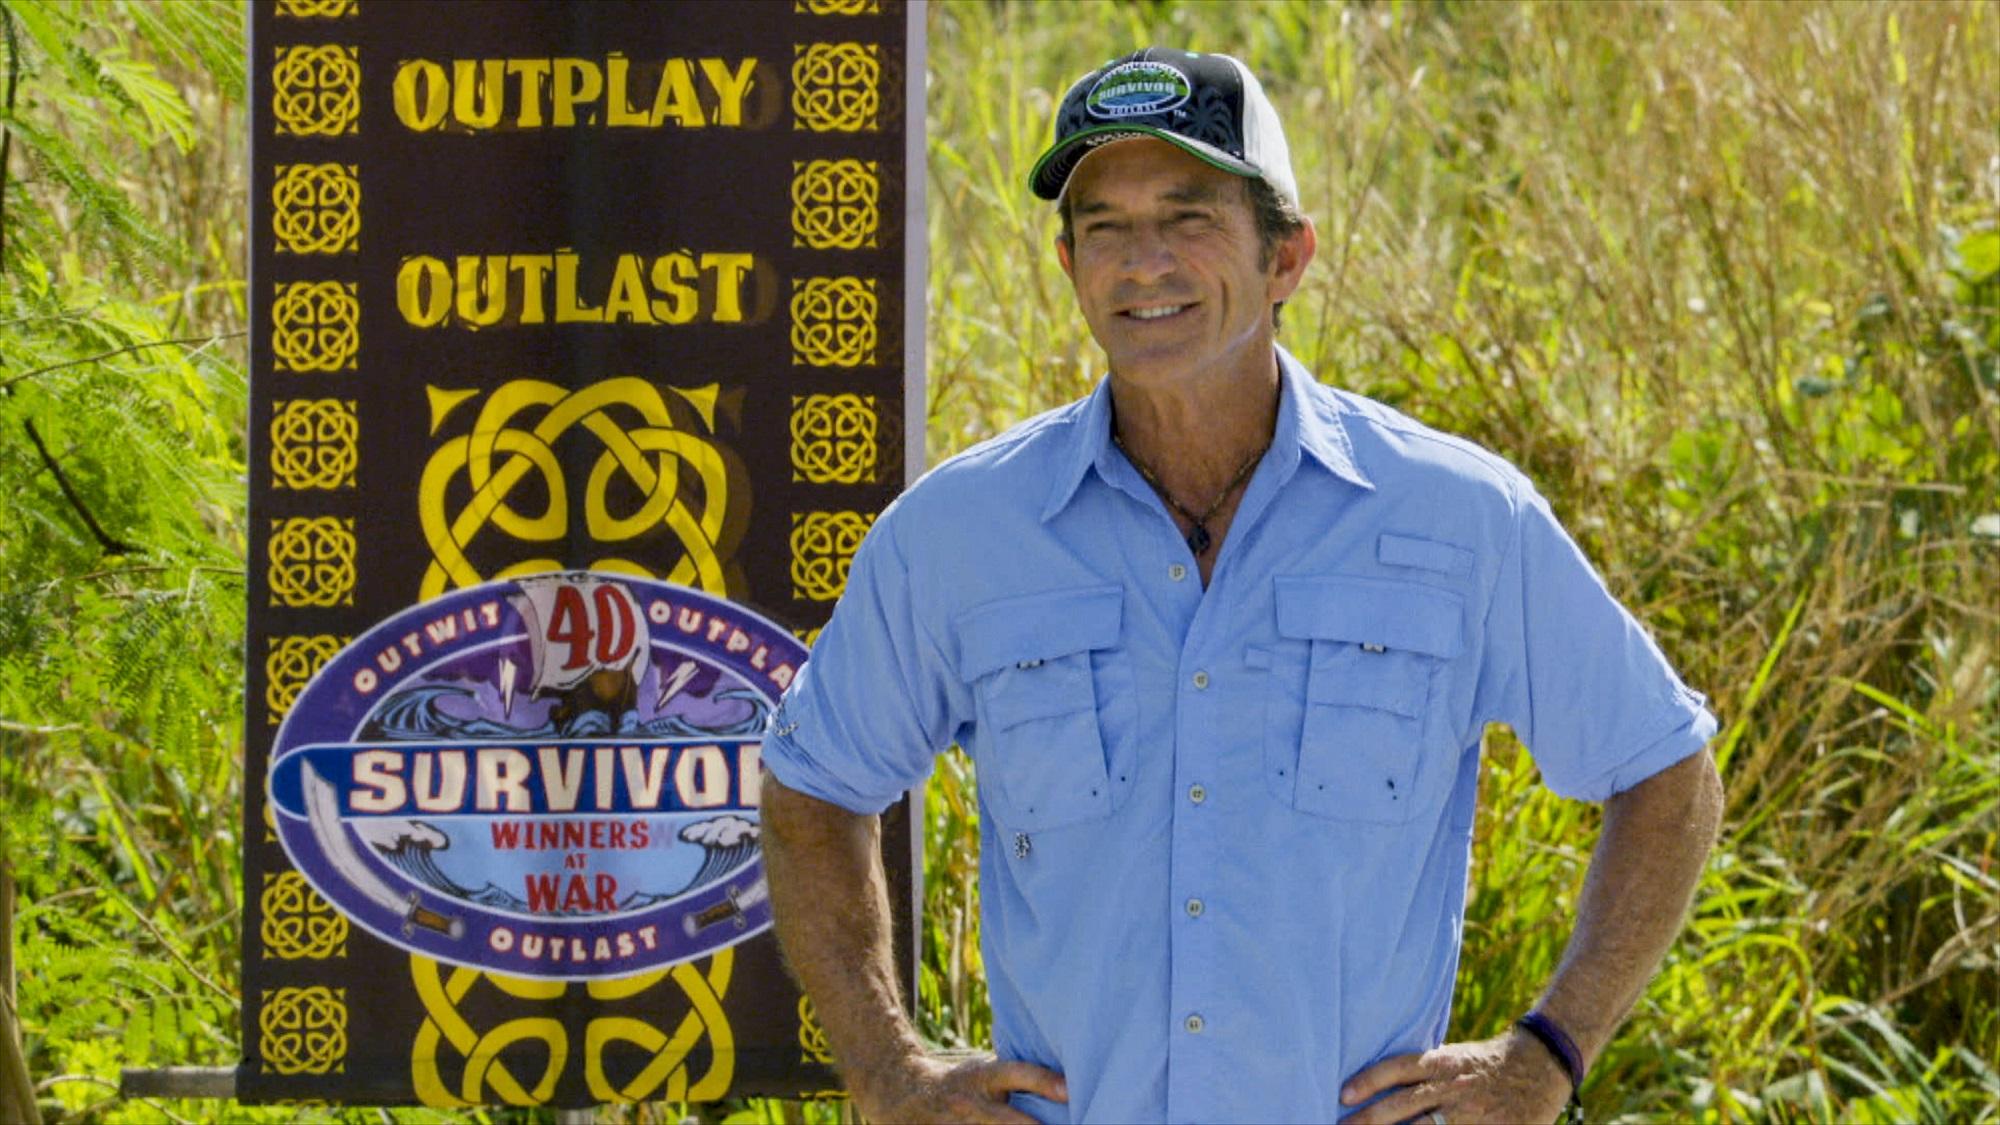 Survivor 41 host Jeff Probst